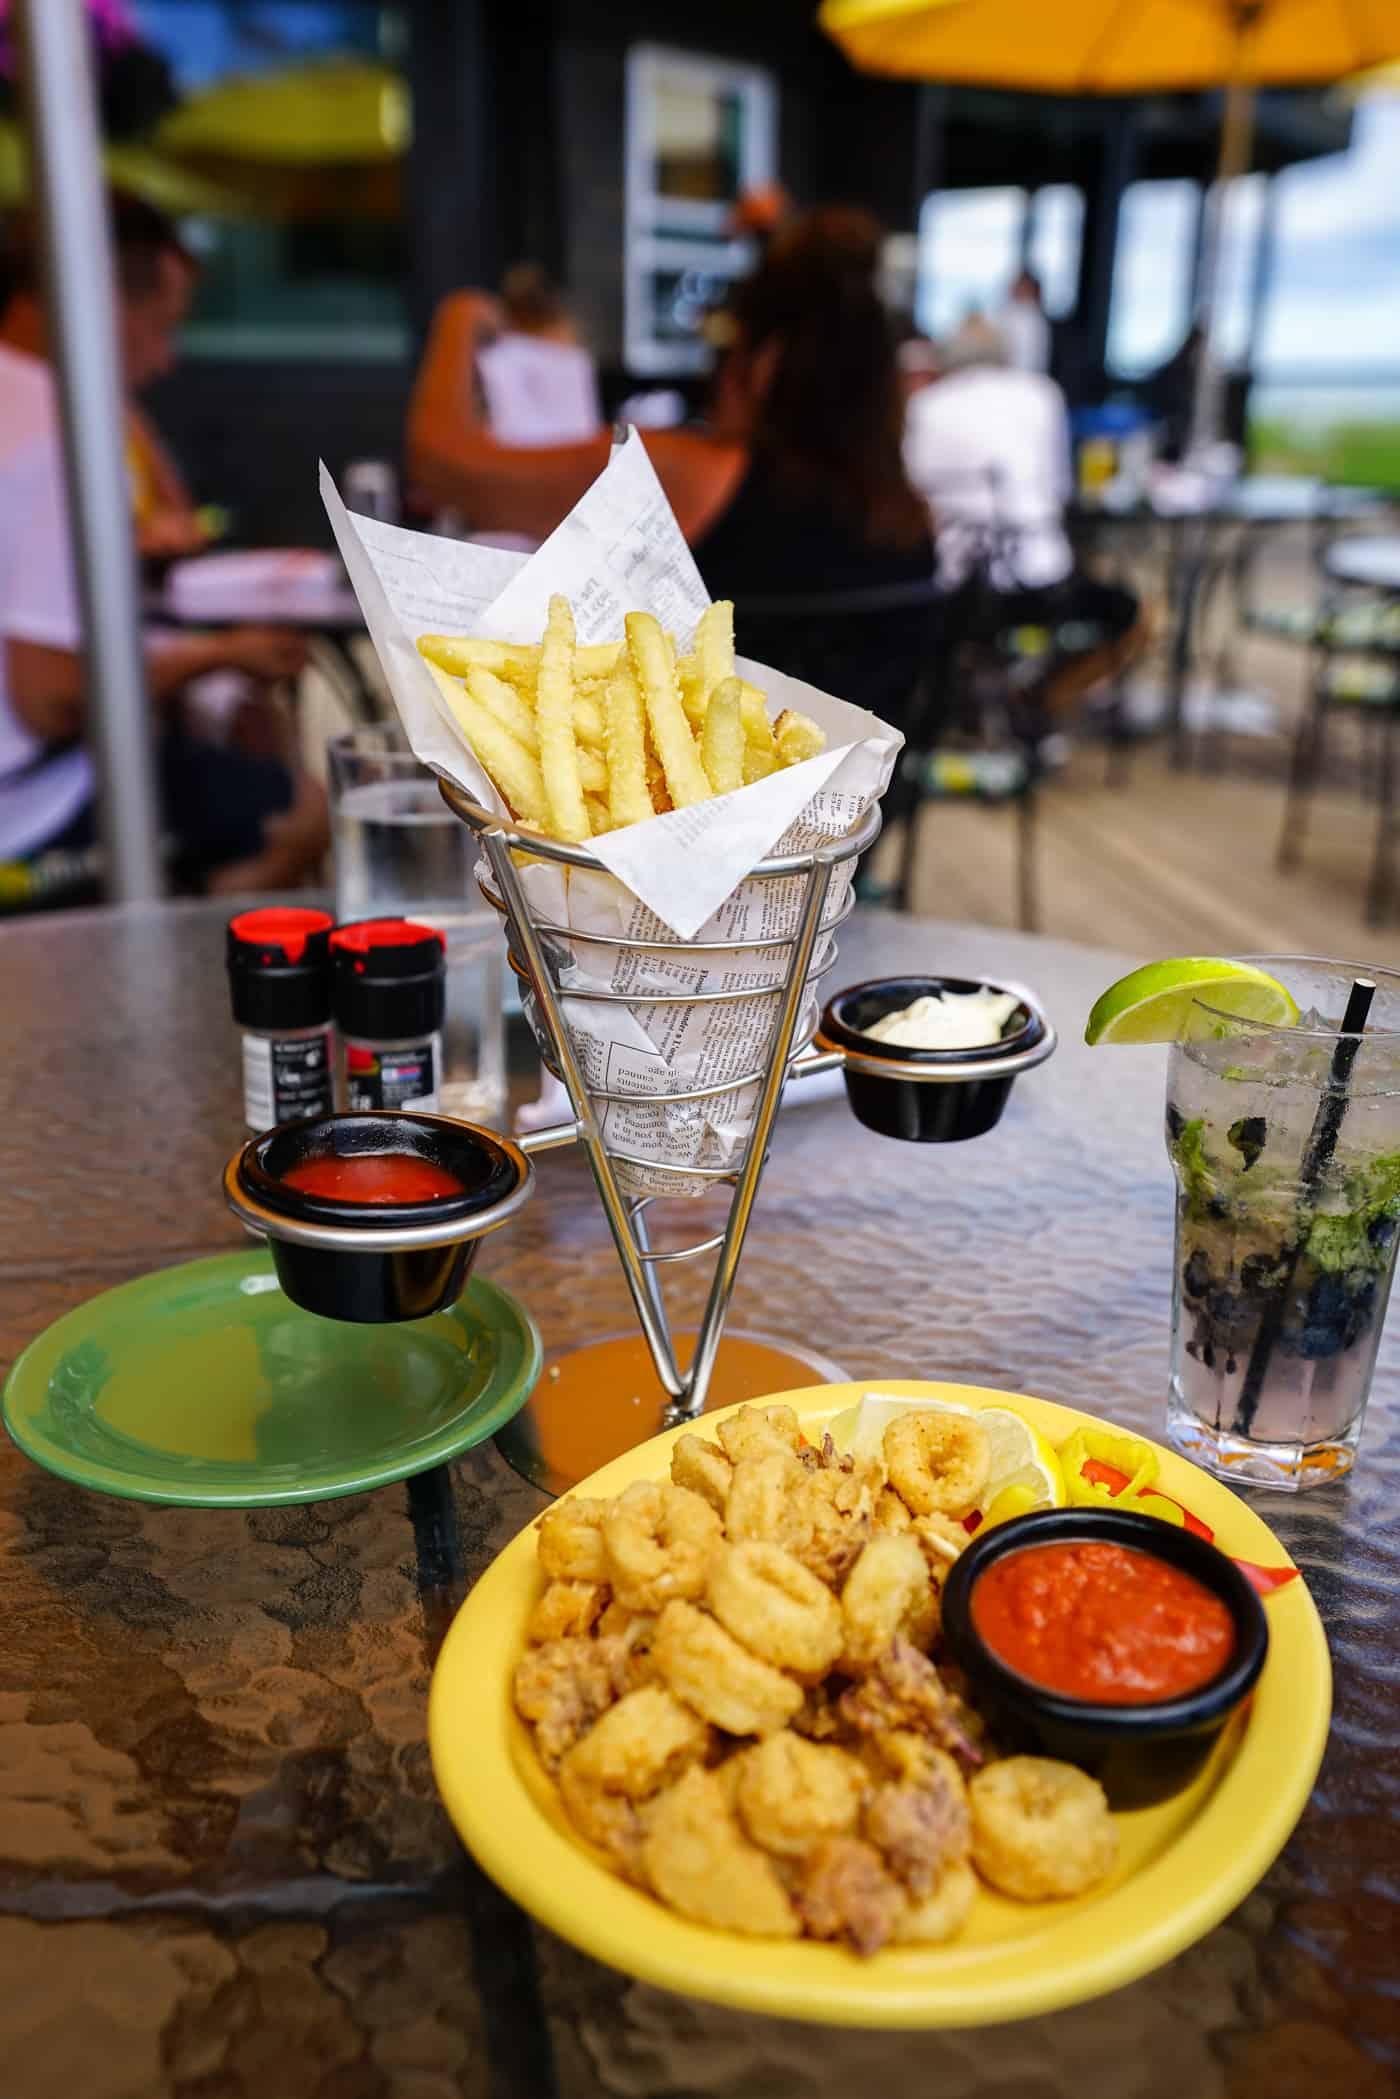 Basket of fries and a plate of calamari